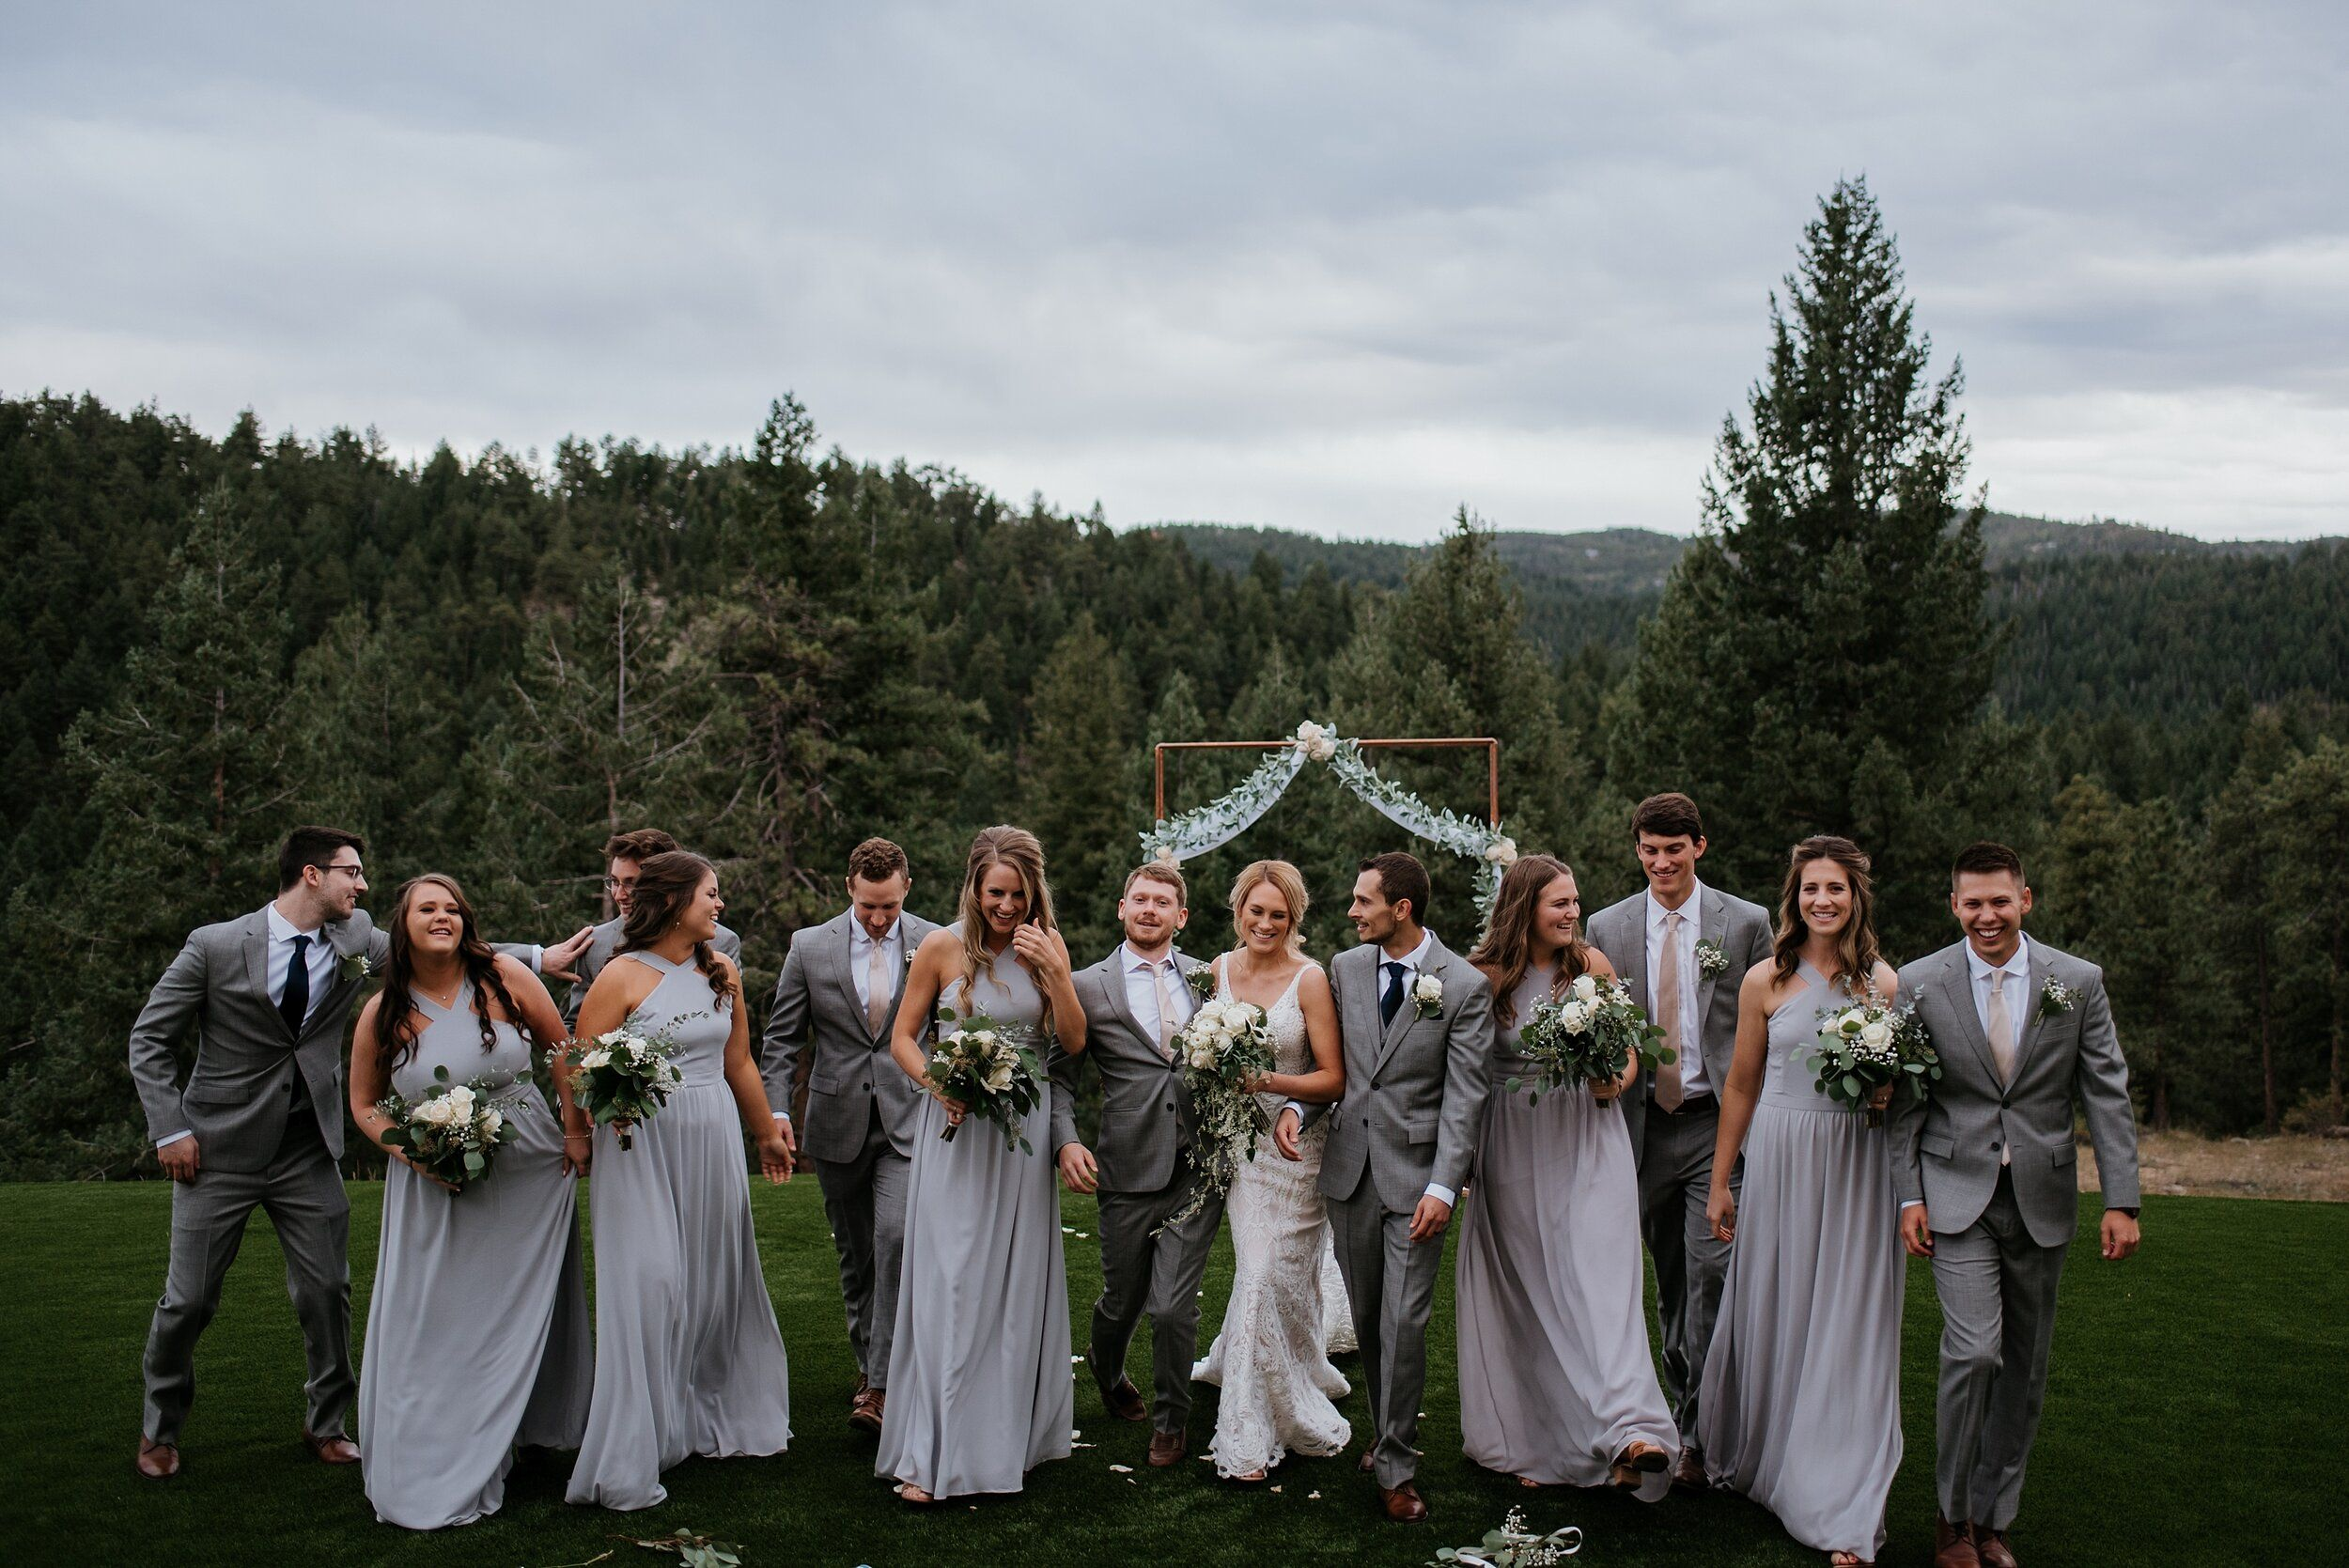 Molly Margaret Photography Woodlands Wedding By Colorado Wedding Photographer Molly Margaret Photography In 2020 Colorado Wedding Wedding Photographers Woodland Wedding Venues